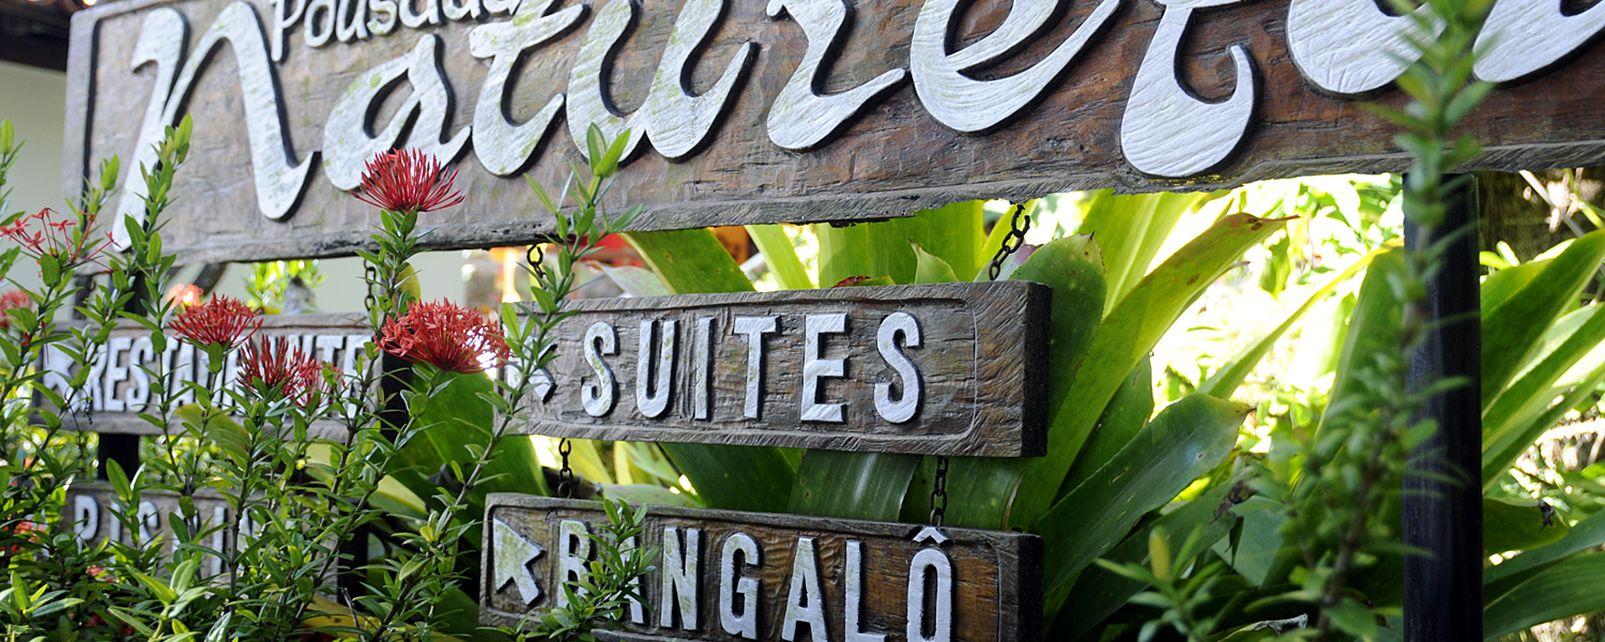 Hotel Pousada Natureza